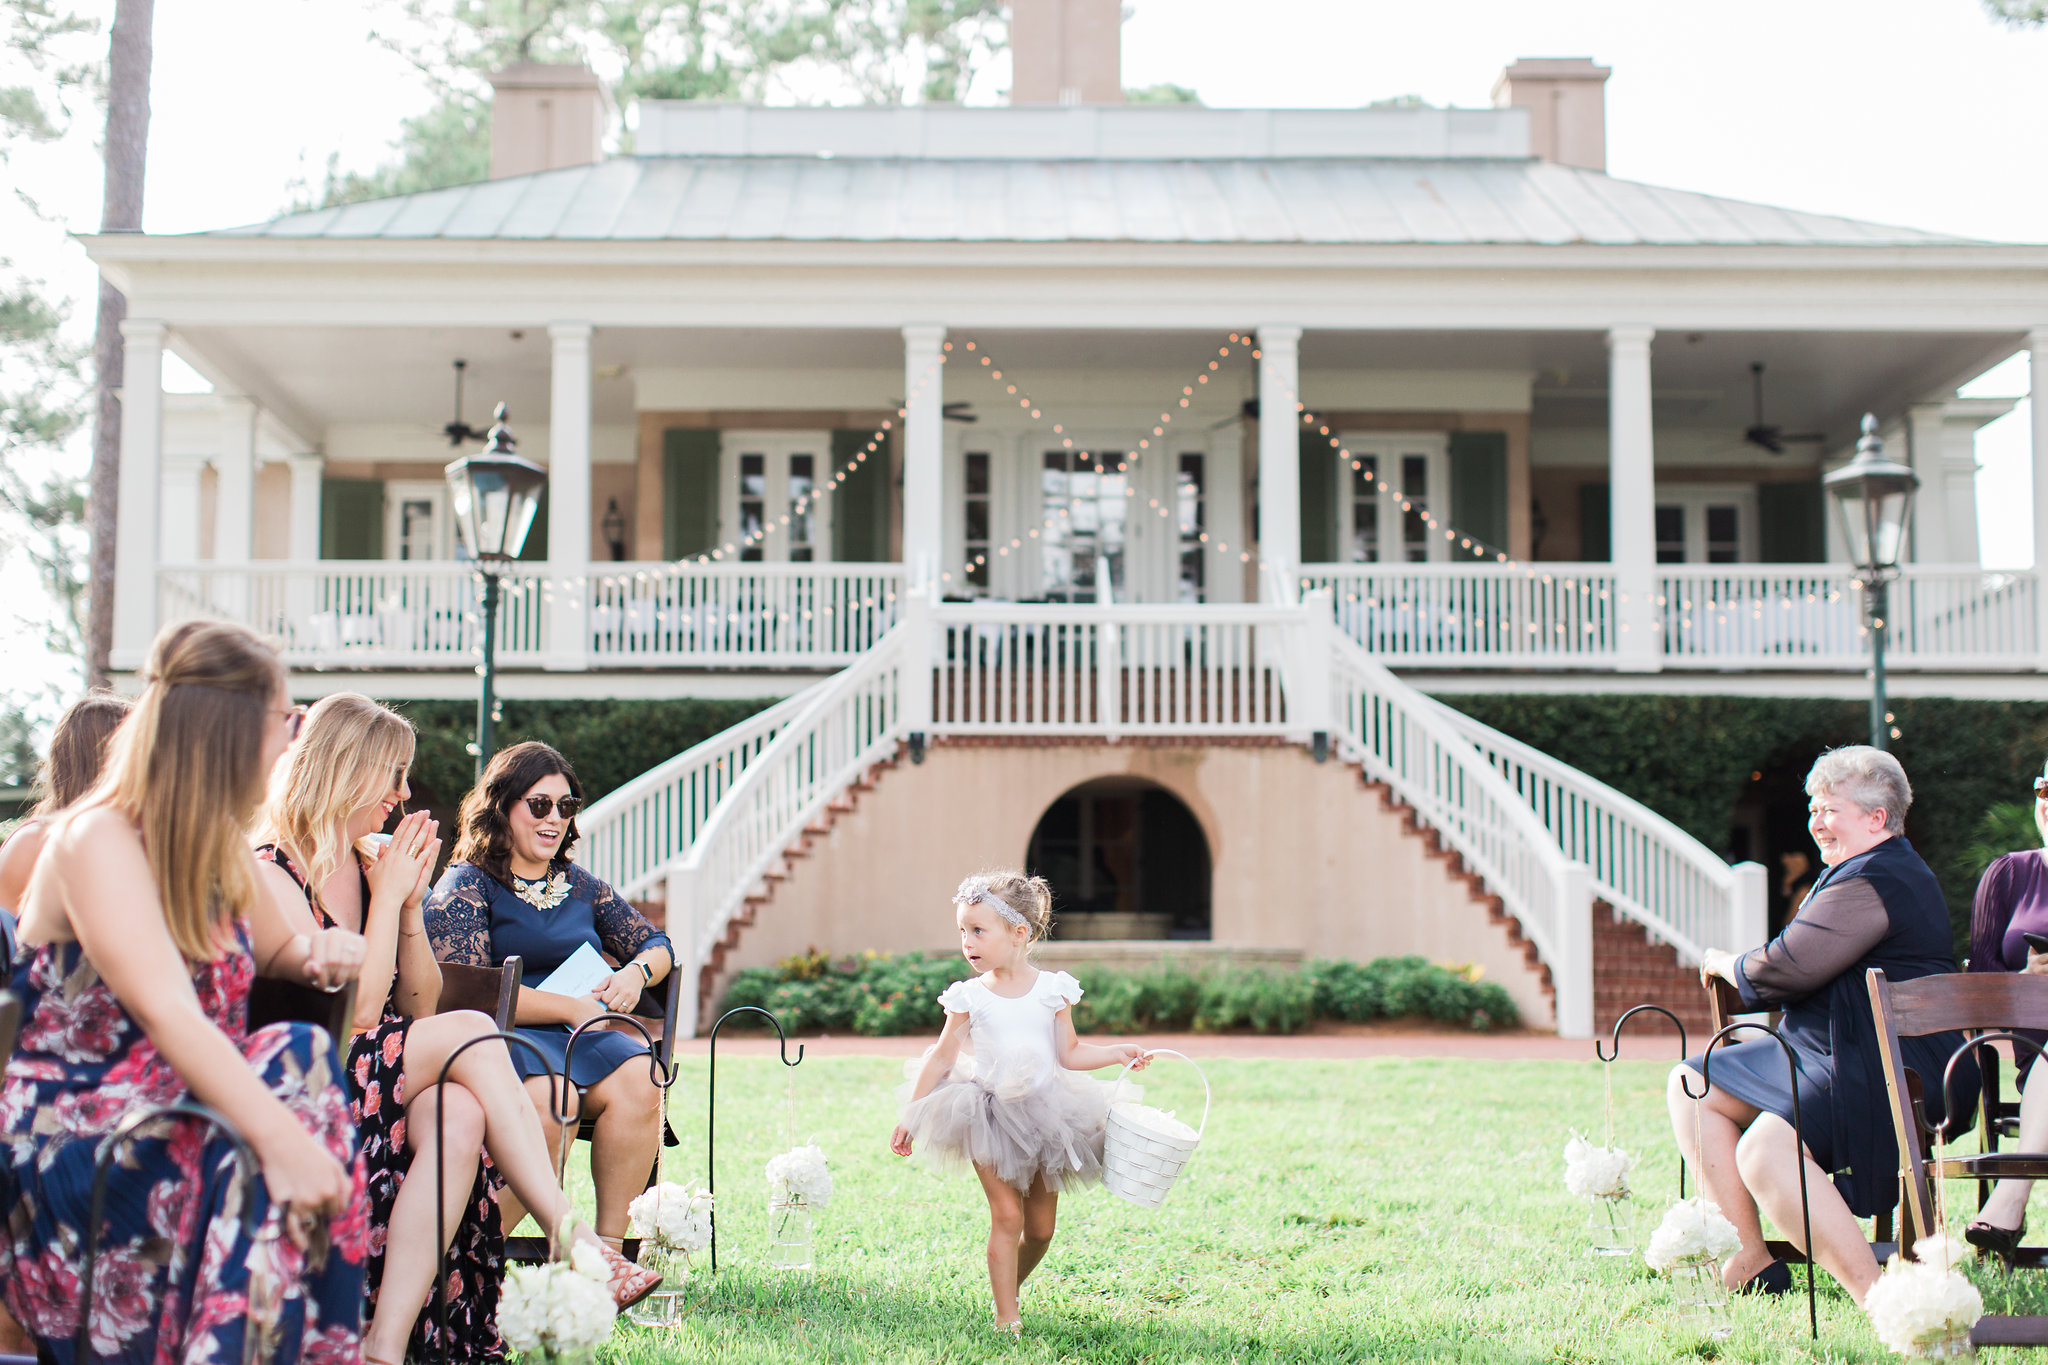 apt-b-photography-lauren-graham-oldfield-wedding-south-carolina-wedding-photographer-savannah-wedding-lowcountry-wedding-coastal-wedding-navy-wedding-plantation-wedding-24.JPG